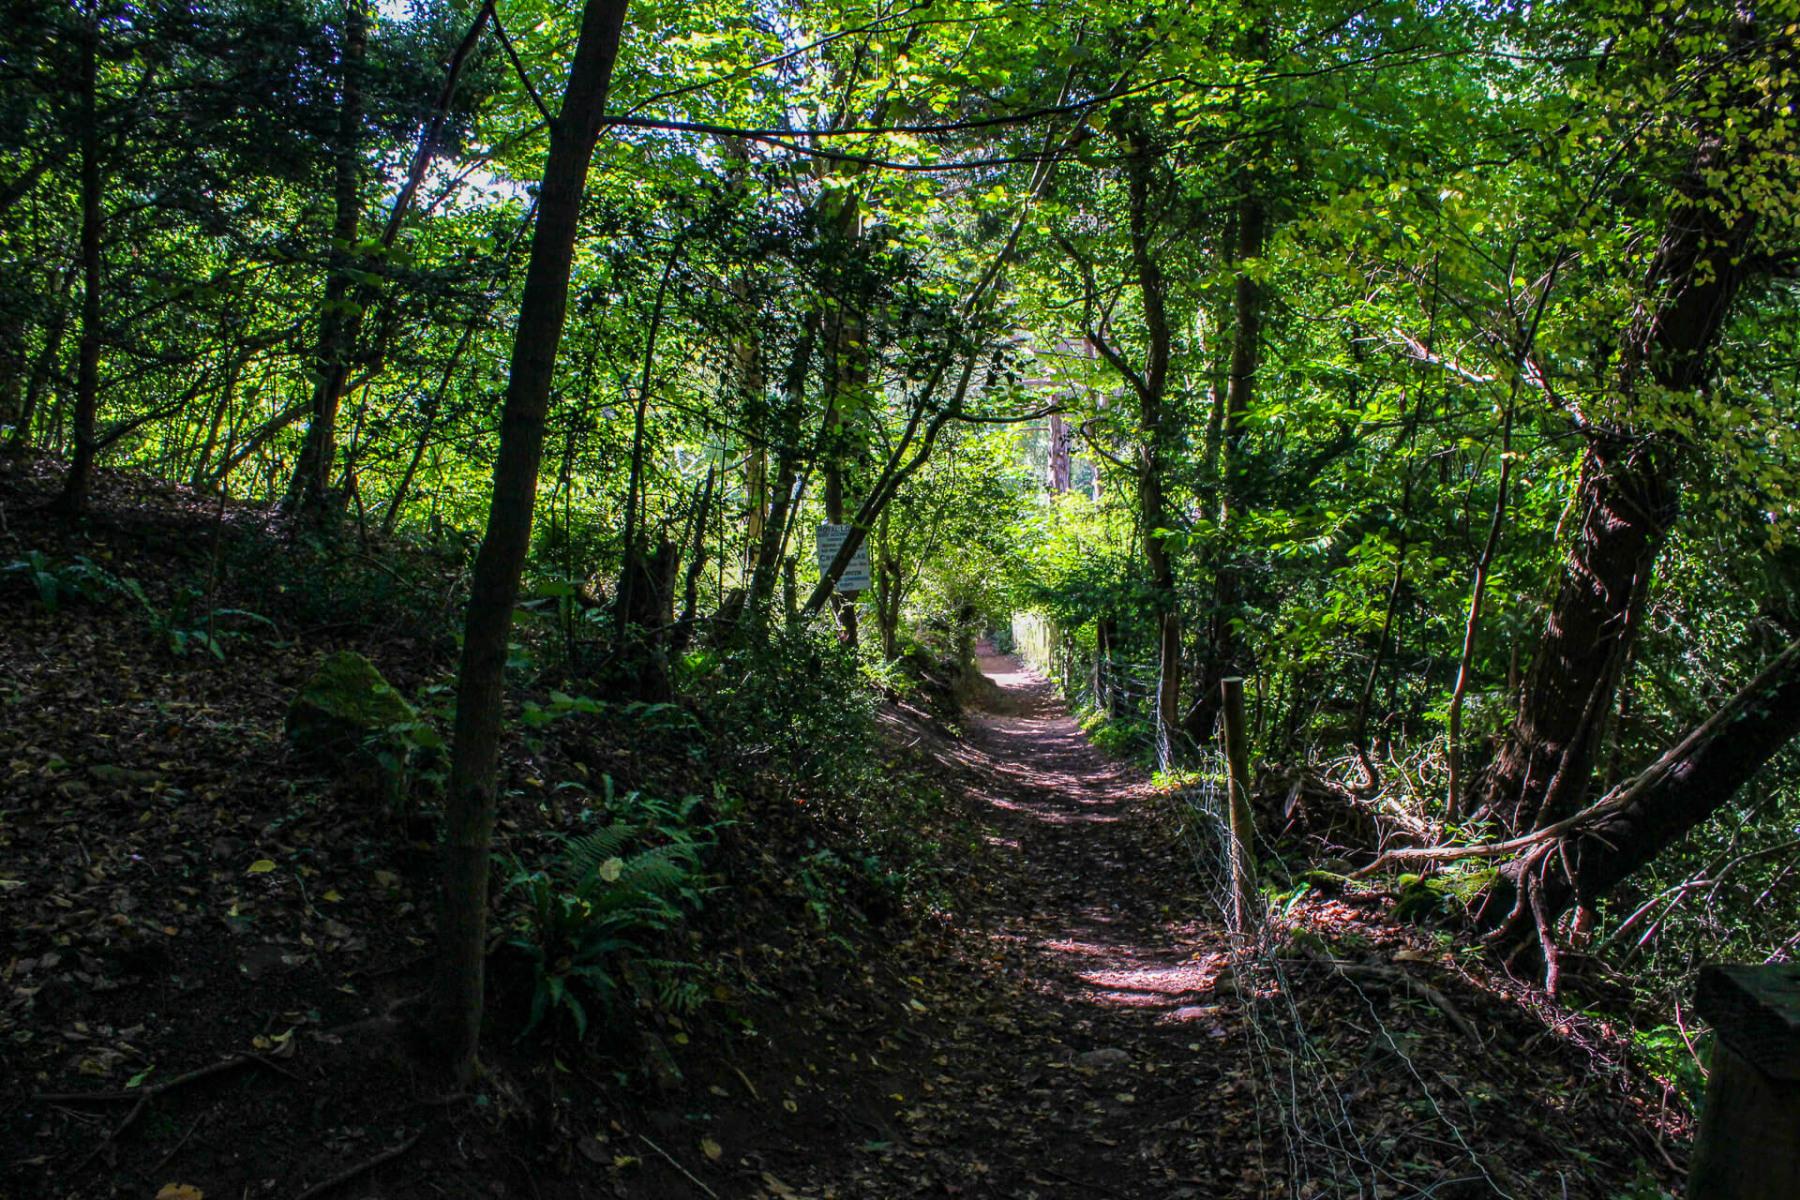 climb-up-to-yat-rock-from-symonds-yat-east-riverside